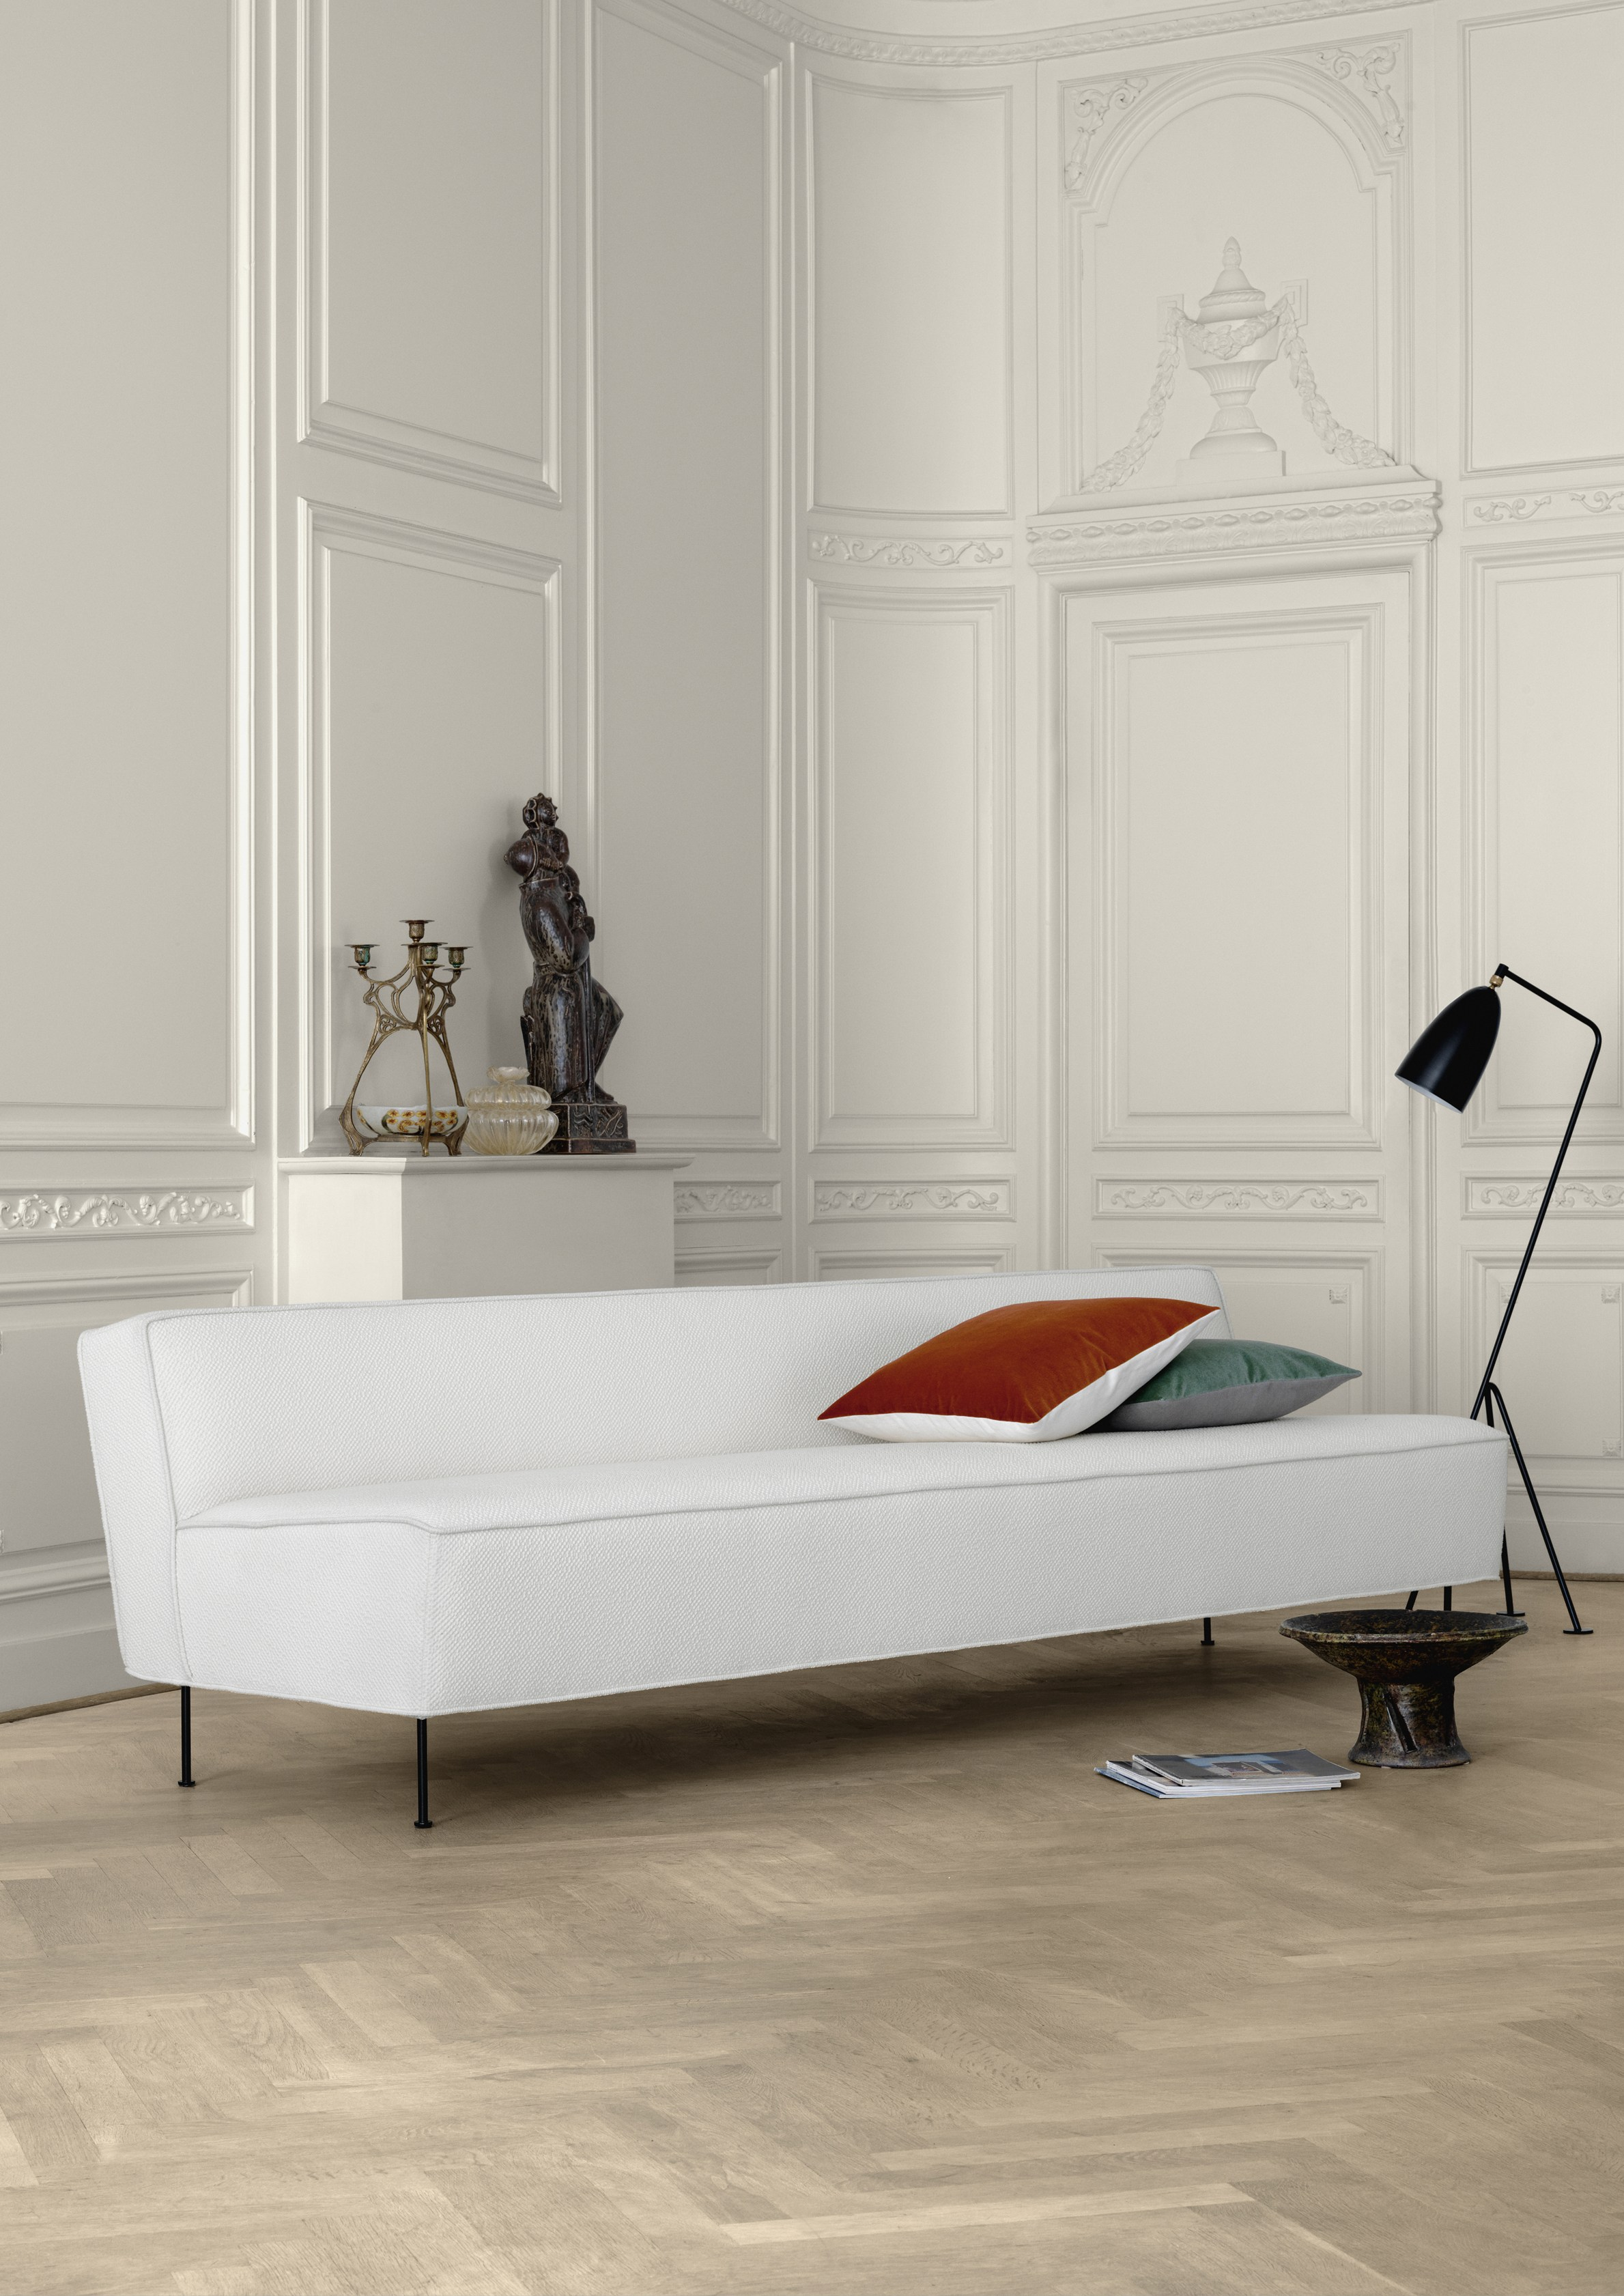 Modern Line Sofa by Greta Magnusson Grossman for GUBI